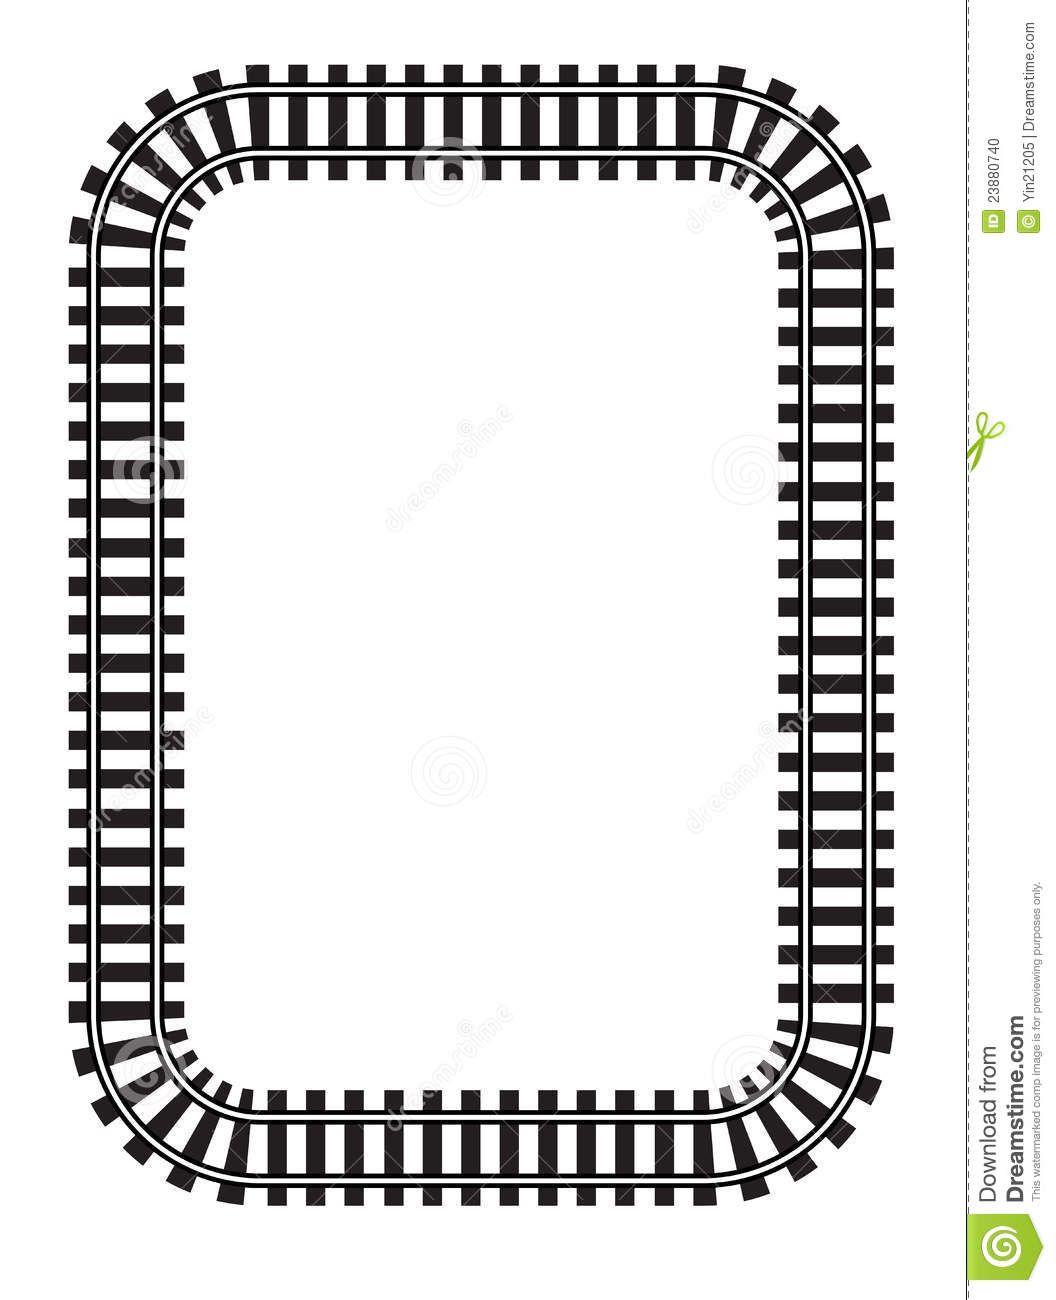 small resolution of train track clipart google search